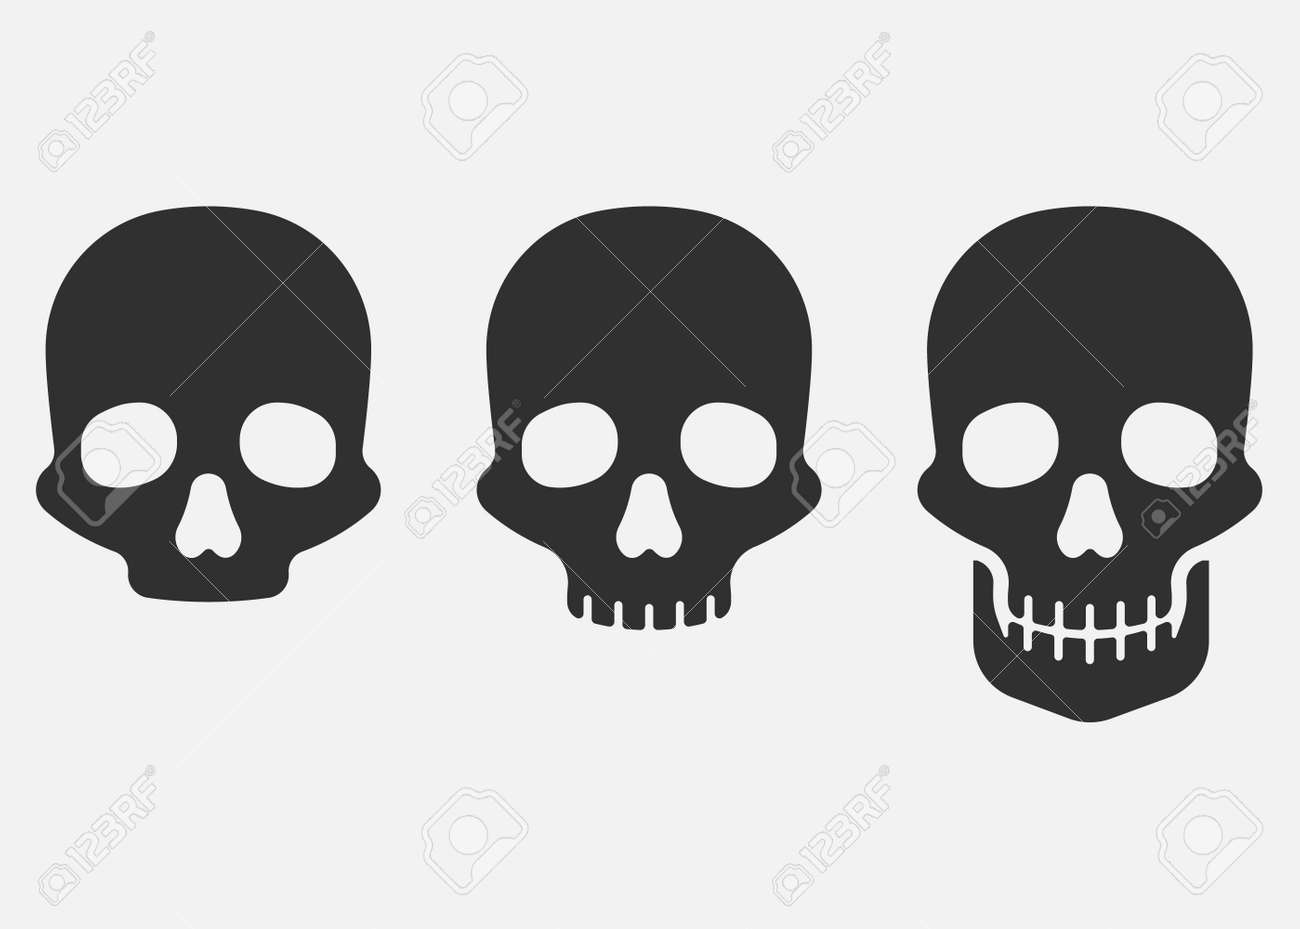 Set of skull icon isolated on white background. Vector illustration. - 166665697